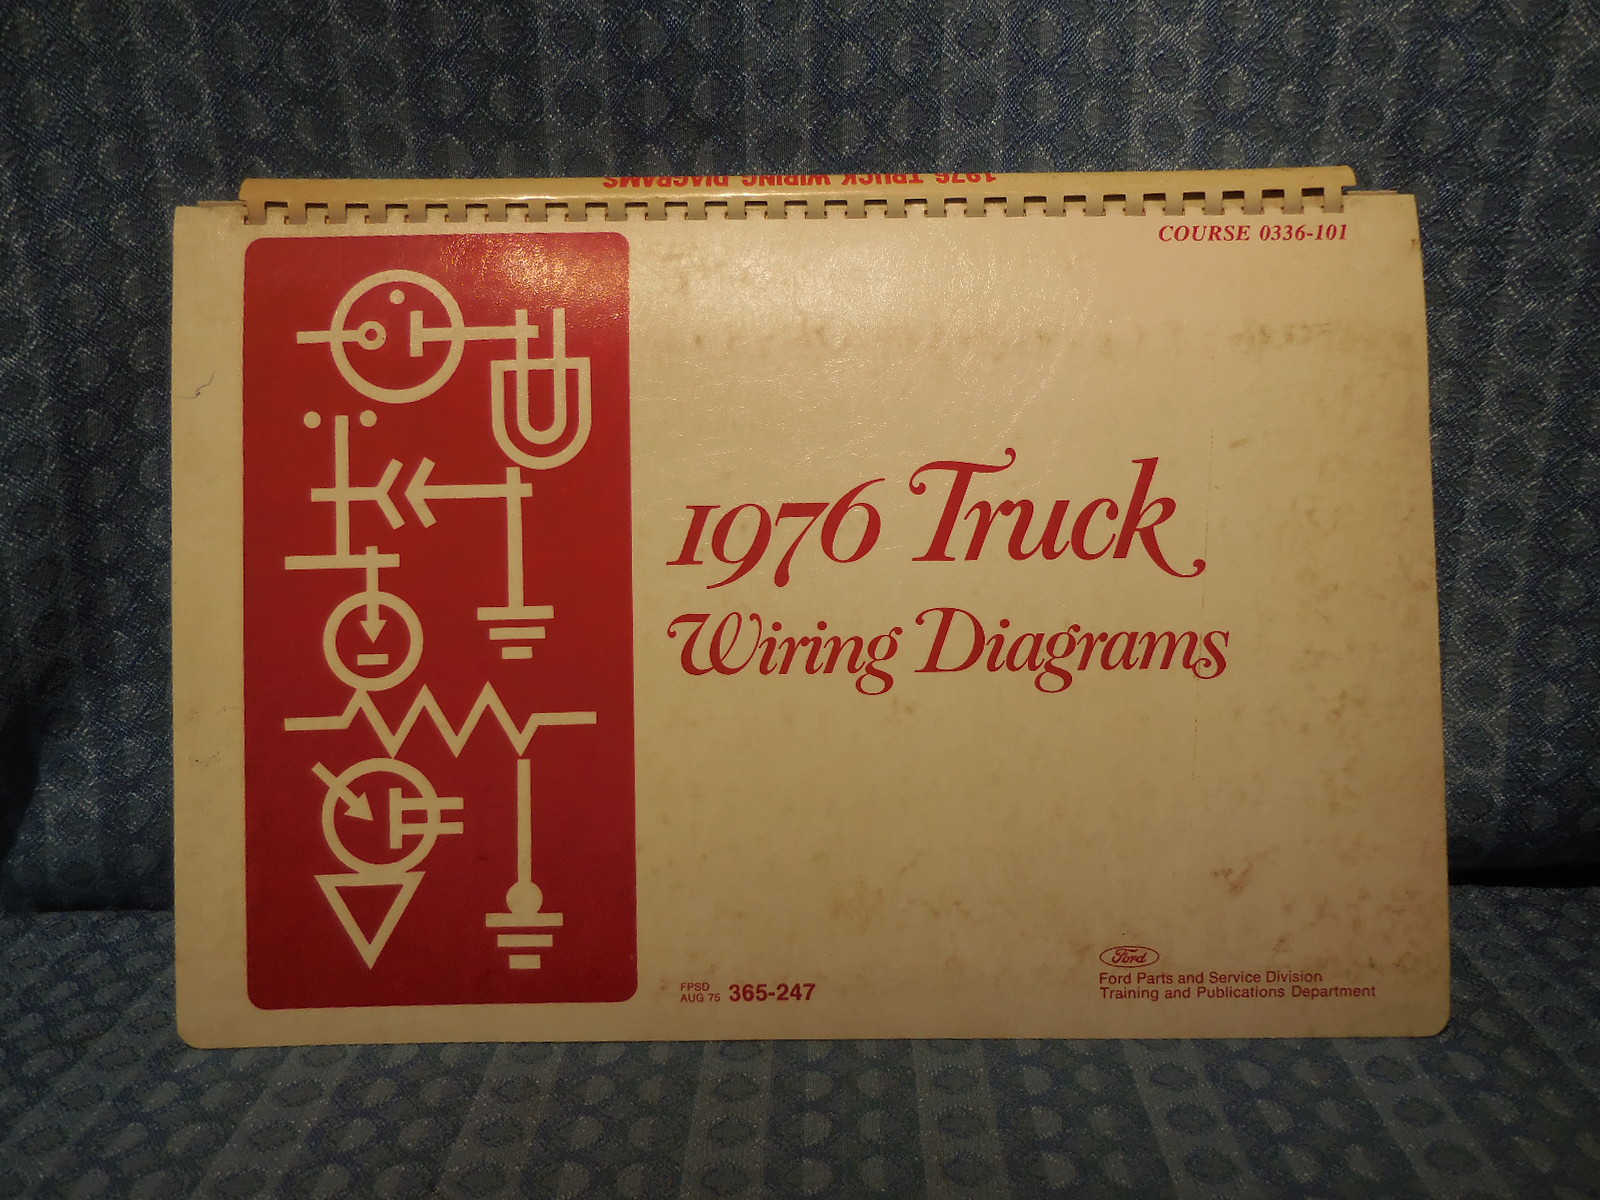 1981 Bronco Wiring Diagram Data Wiring Diagrams \u2022 81 Bronco Wiring  Diagram 75 Bronco Wiring Diagram